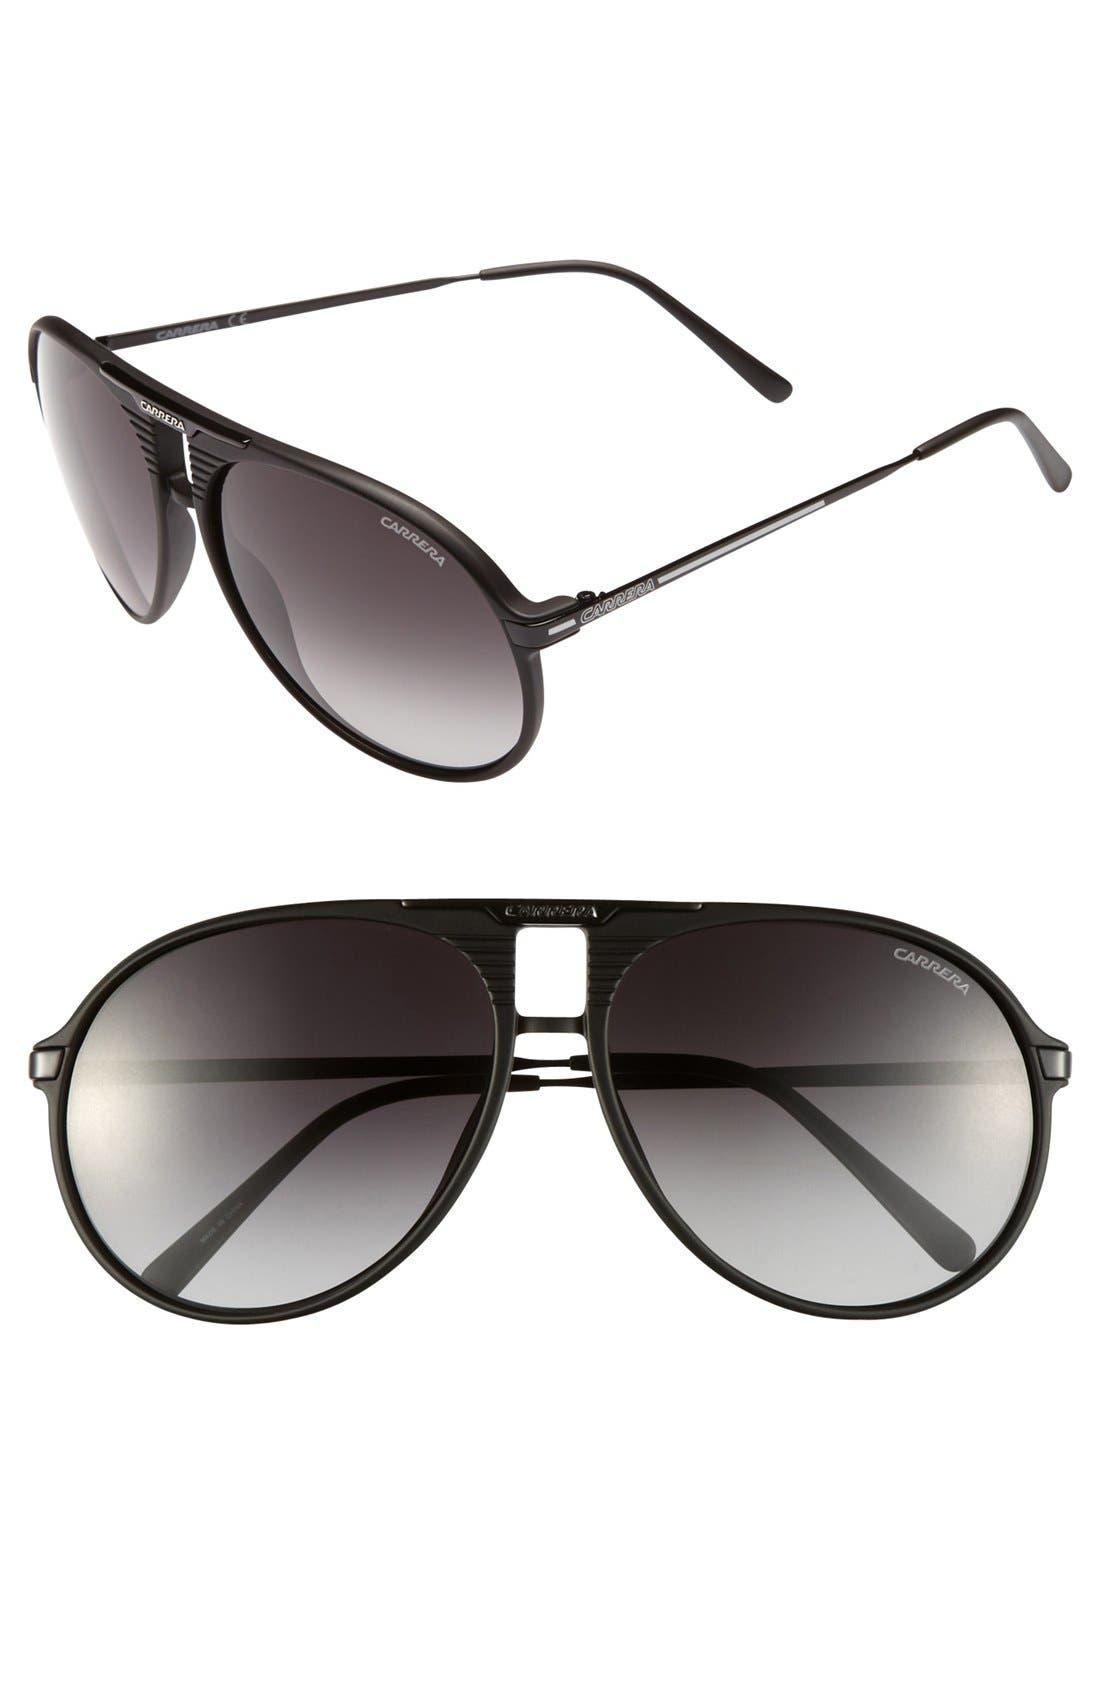 Alternate Image 1 Selected - Carrera Eyewear 60mm Aviator Sunglasses